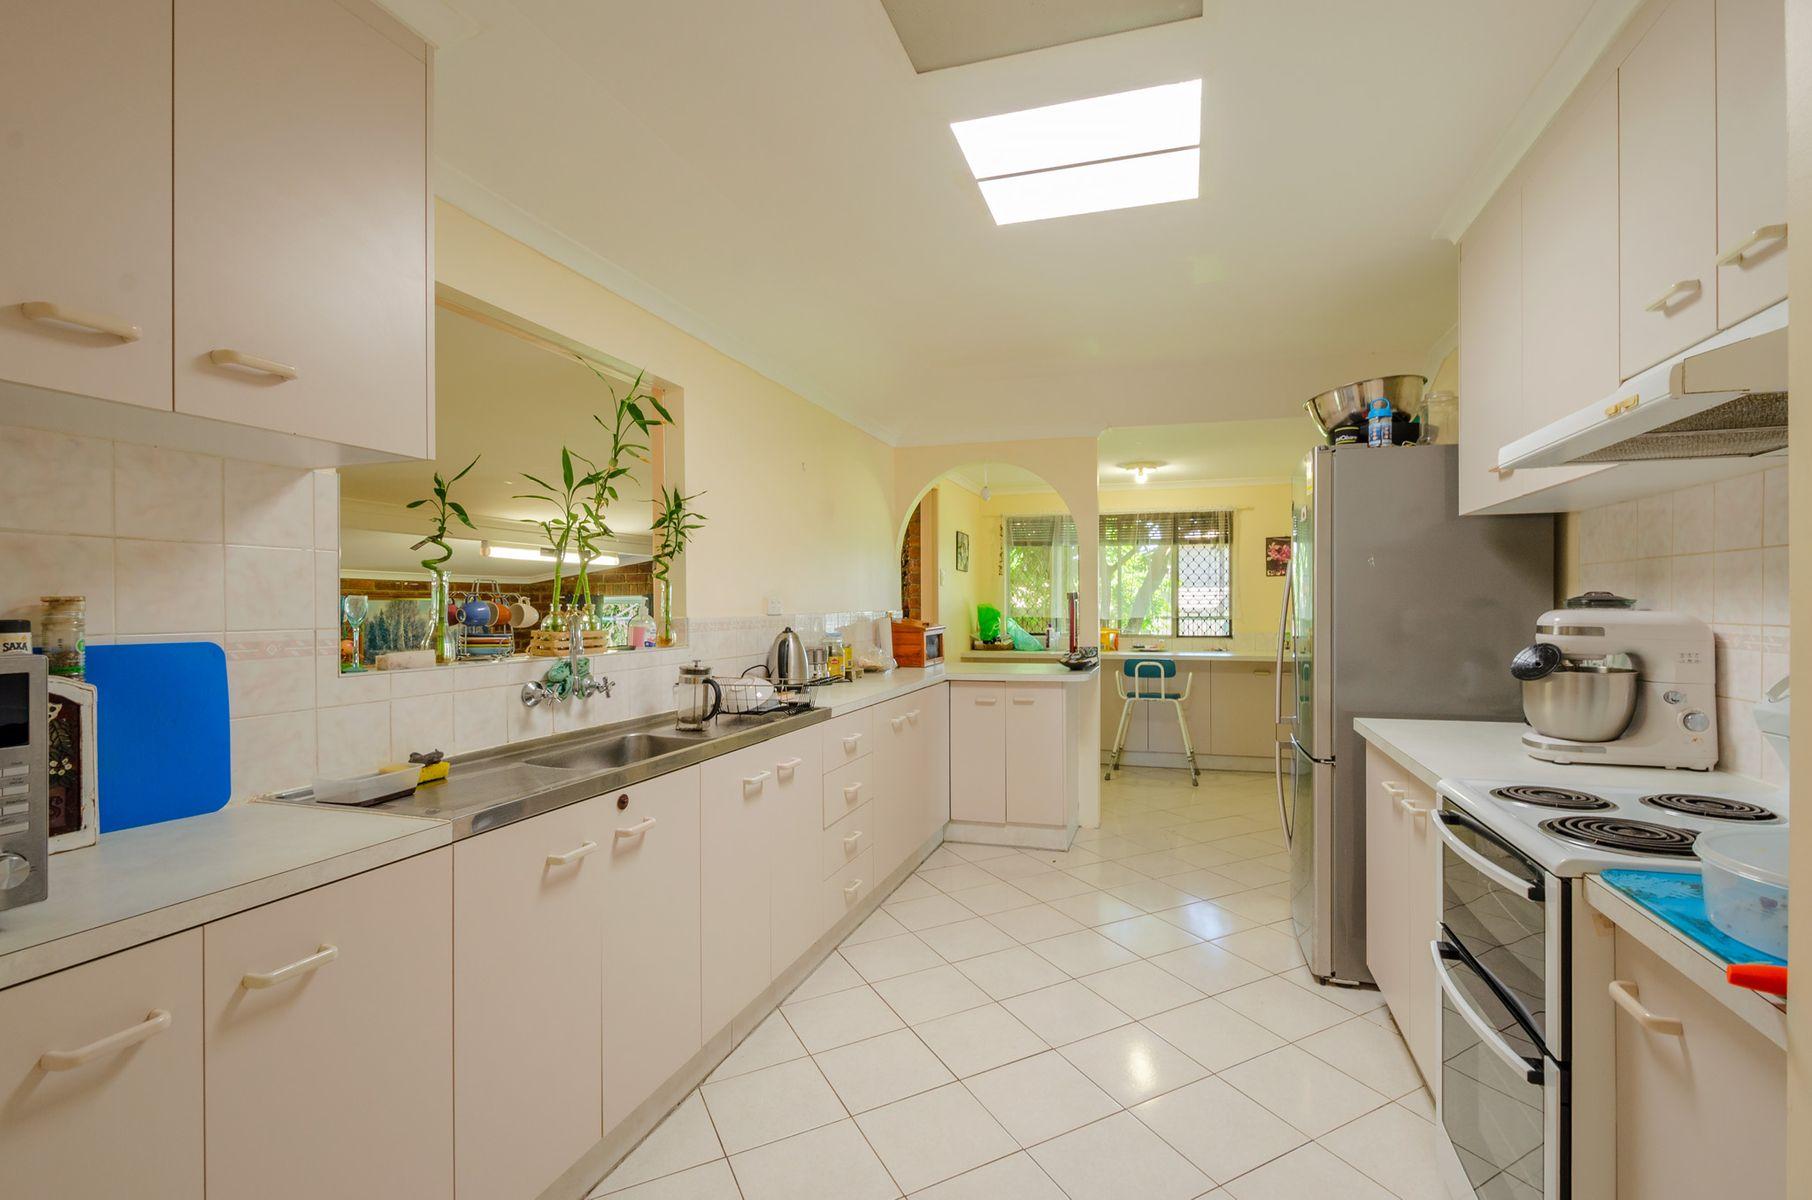 292 Goodwood Road, Thabeban, QLD 4670